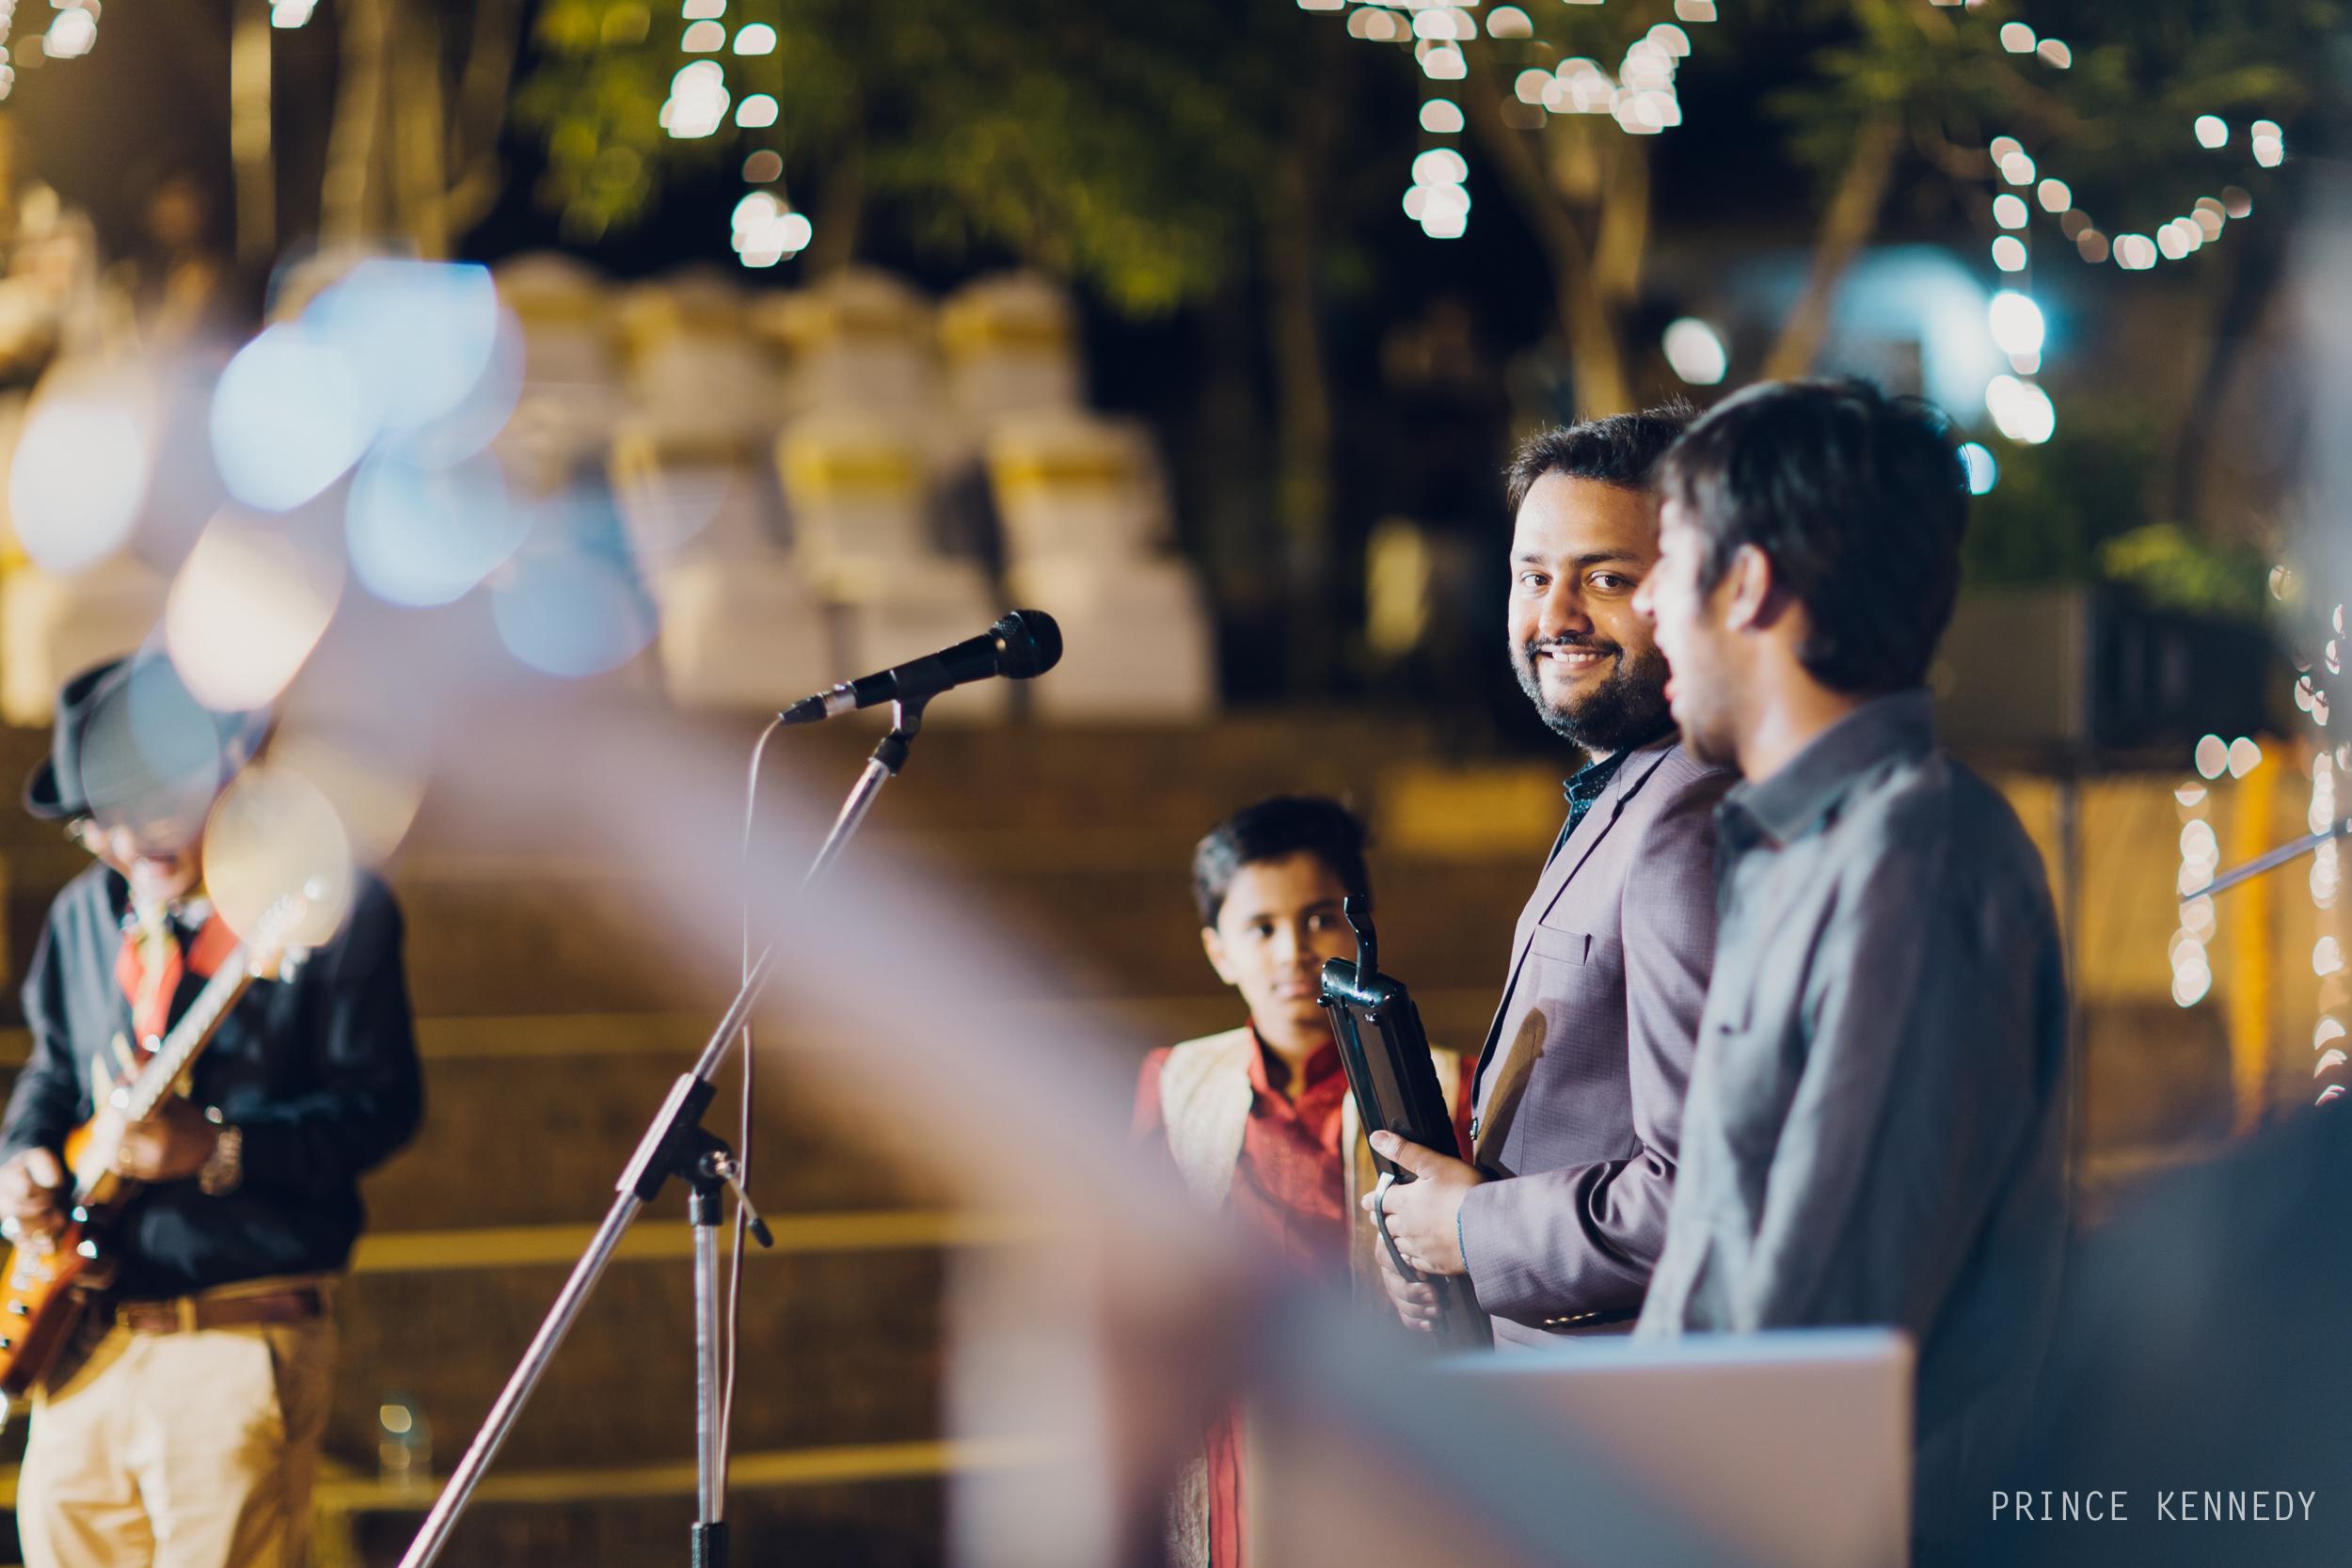 Athmajja-Nithesh-Engagement-Couple-Portrait-Portraiture-Wedding-Couple-Portrait-Chennai-Photographer-Candid-Photography-Destination-Best-Prince-Kennedy-Photography-200.jpg